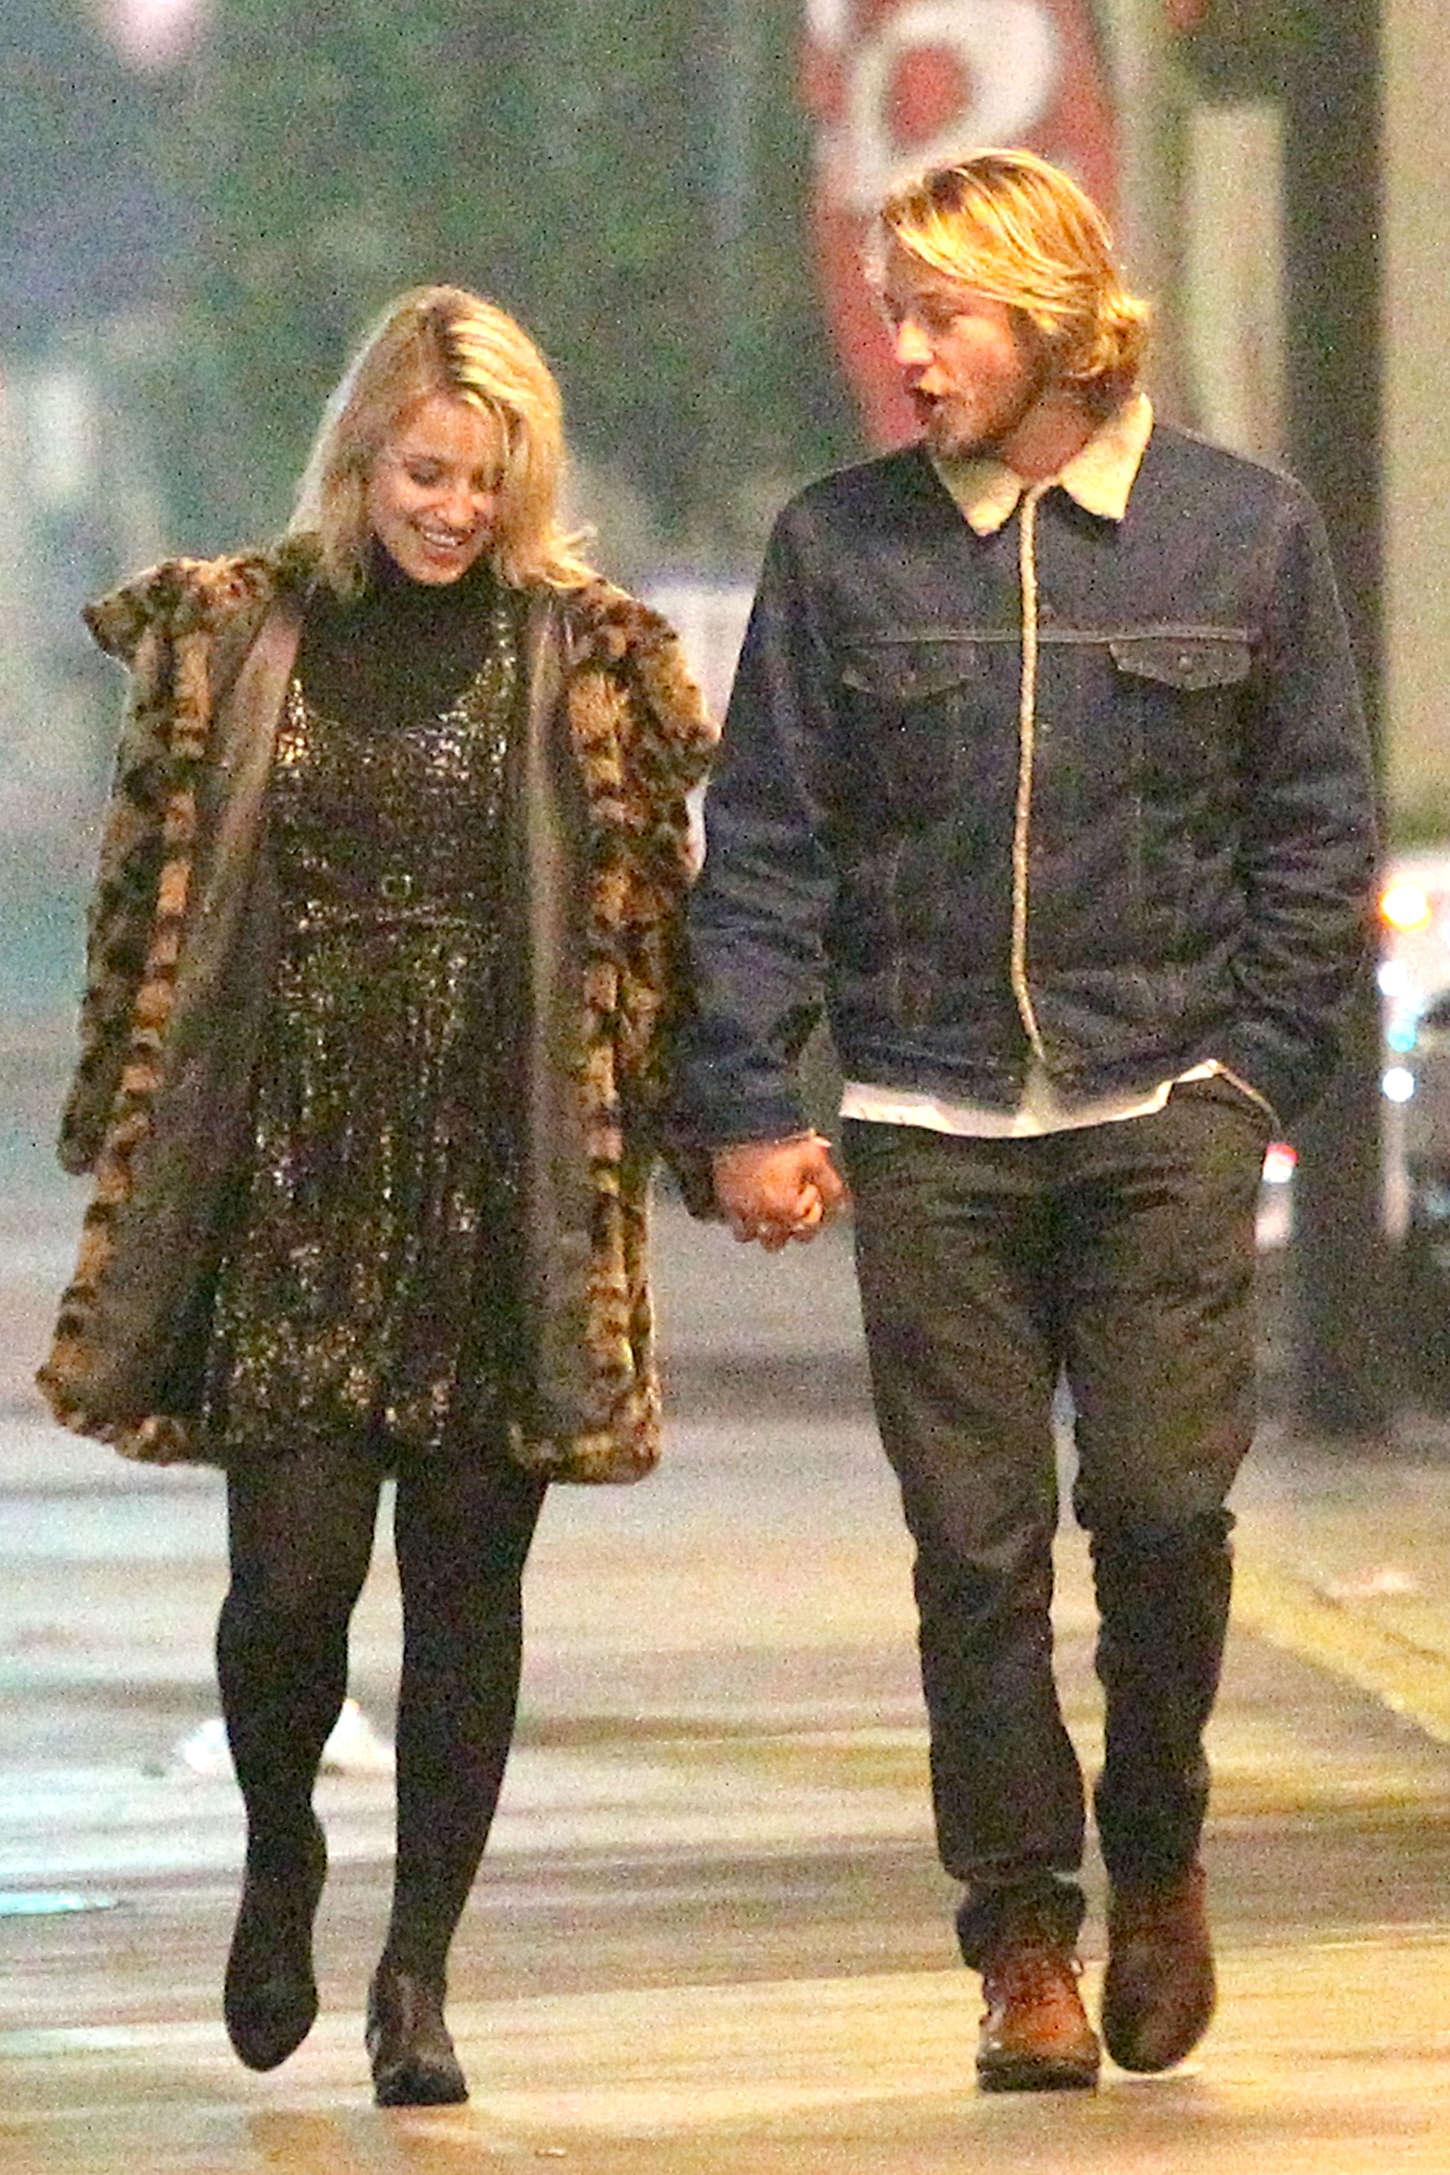 Dianna Agron With her Boyfriend -19 – GotCeleb